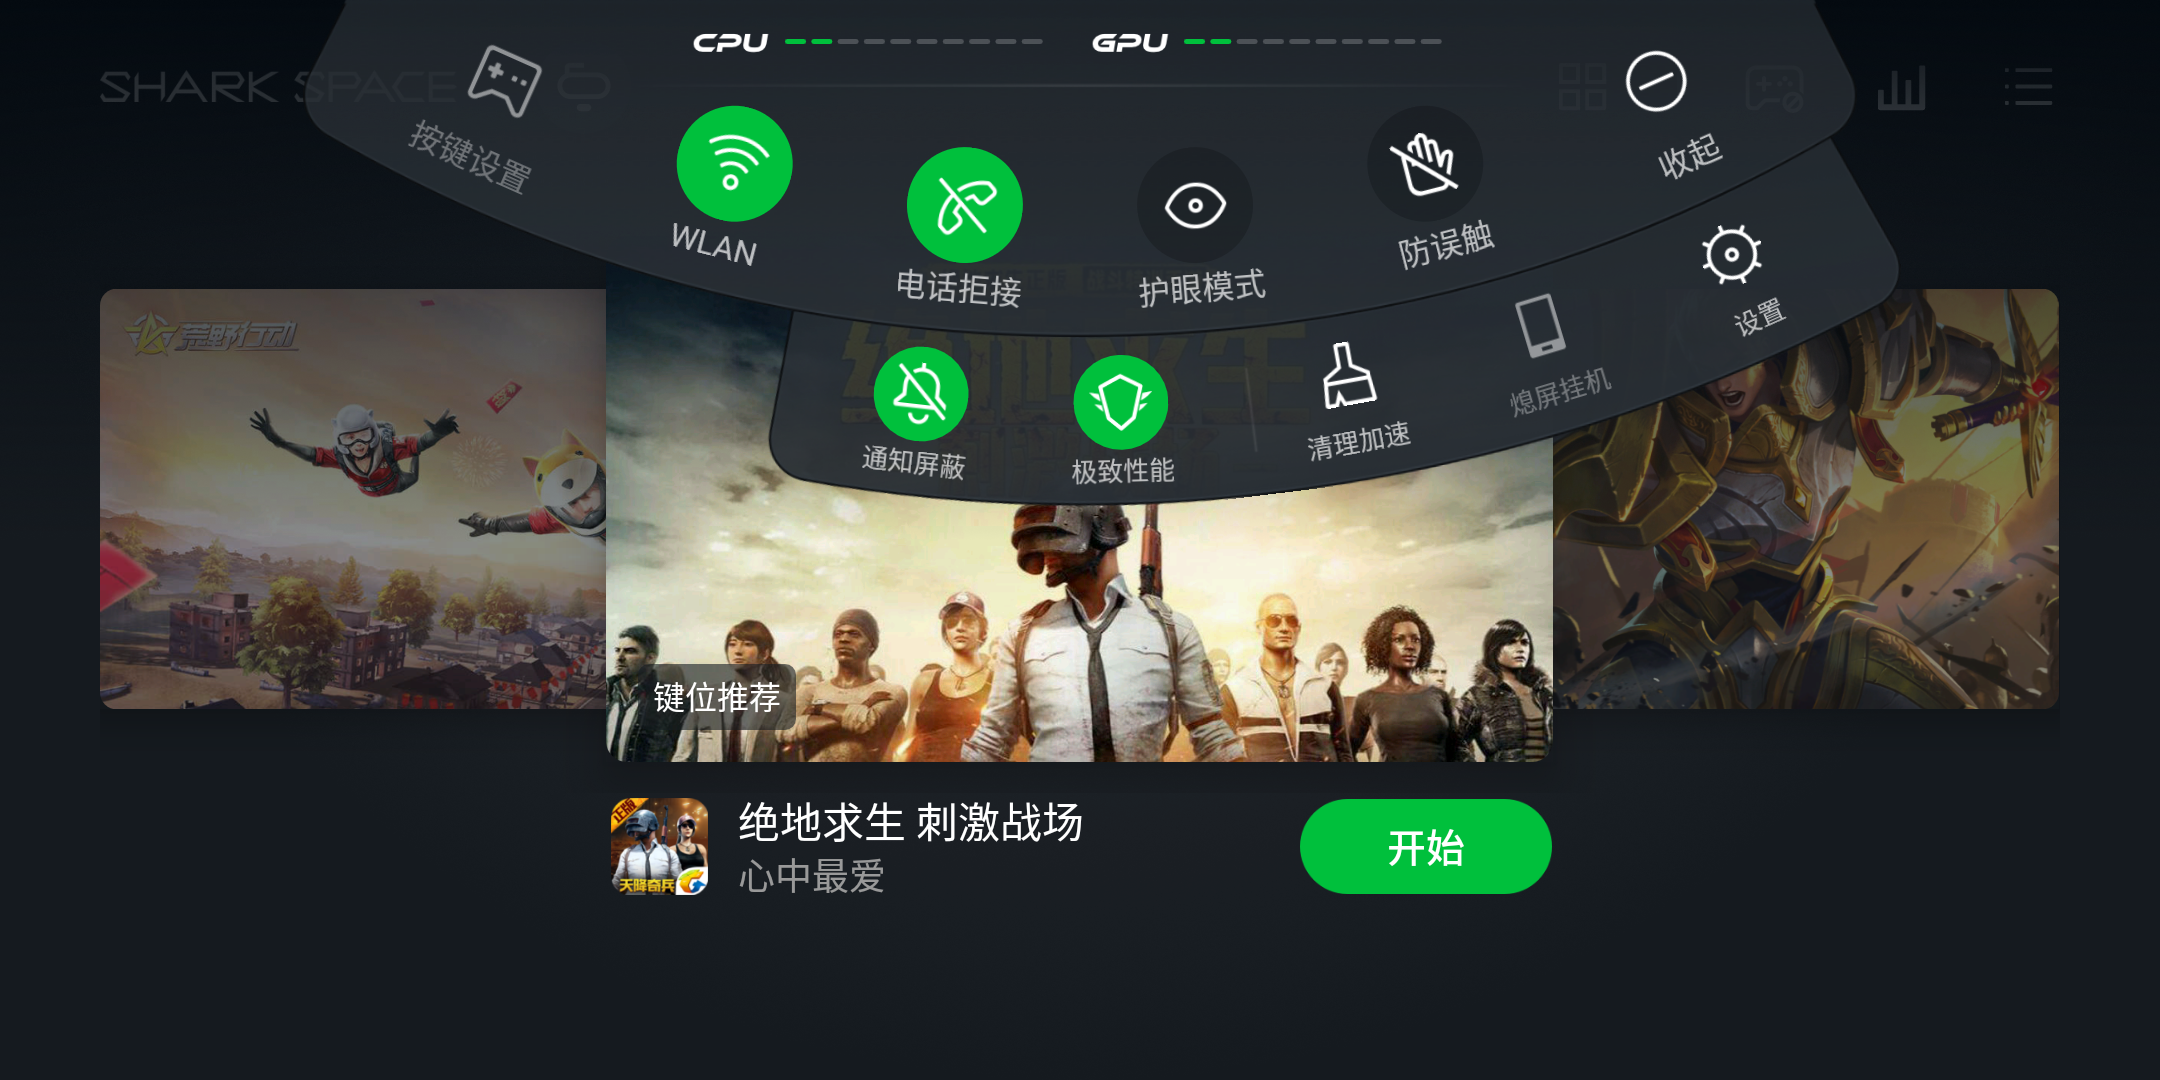 Screenshot_2018-06-01-08-56-27-795_com.blackshark.gamelauncher.png